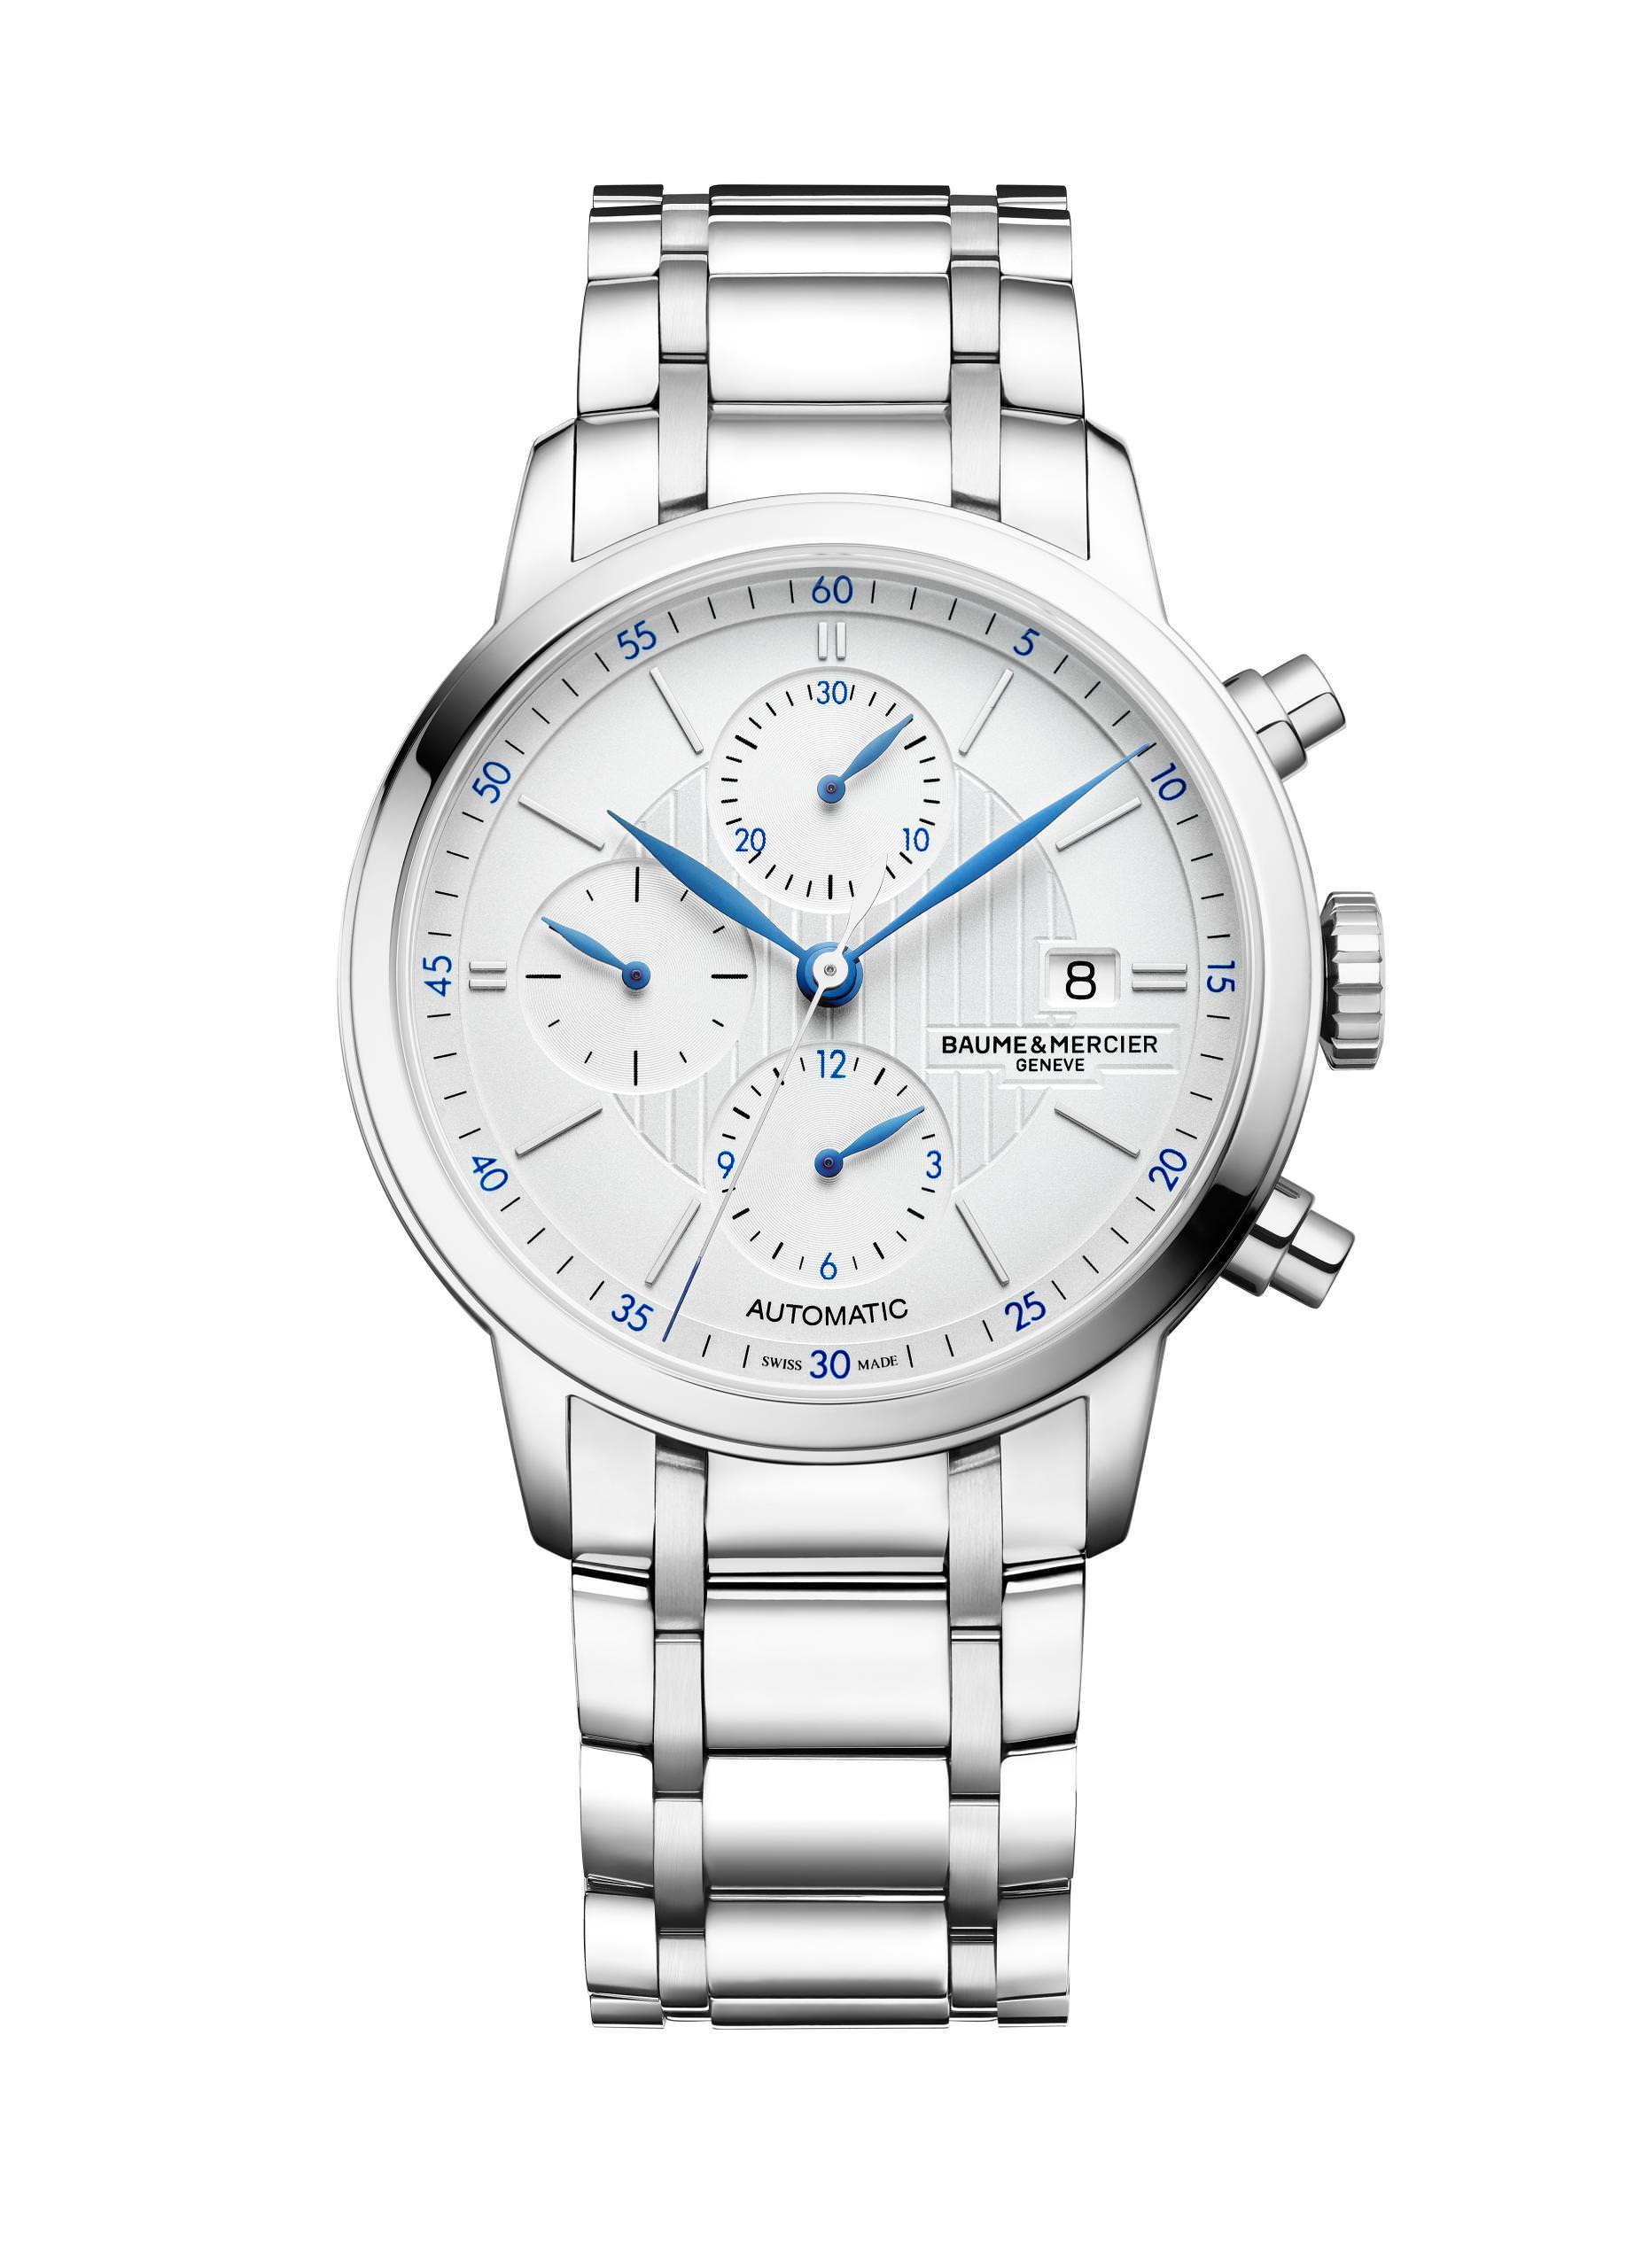 Baume Et Mercier An Affordable Luxury Gentlemans Gazette Sweety Silver Pantz L54 The Classima Chronograph